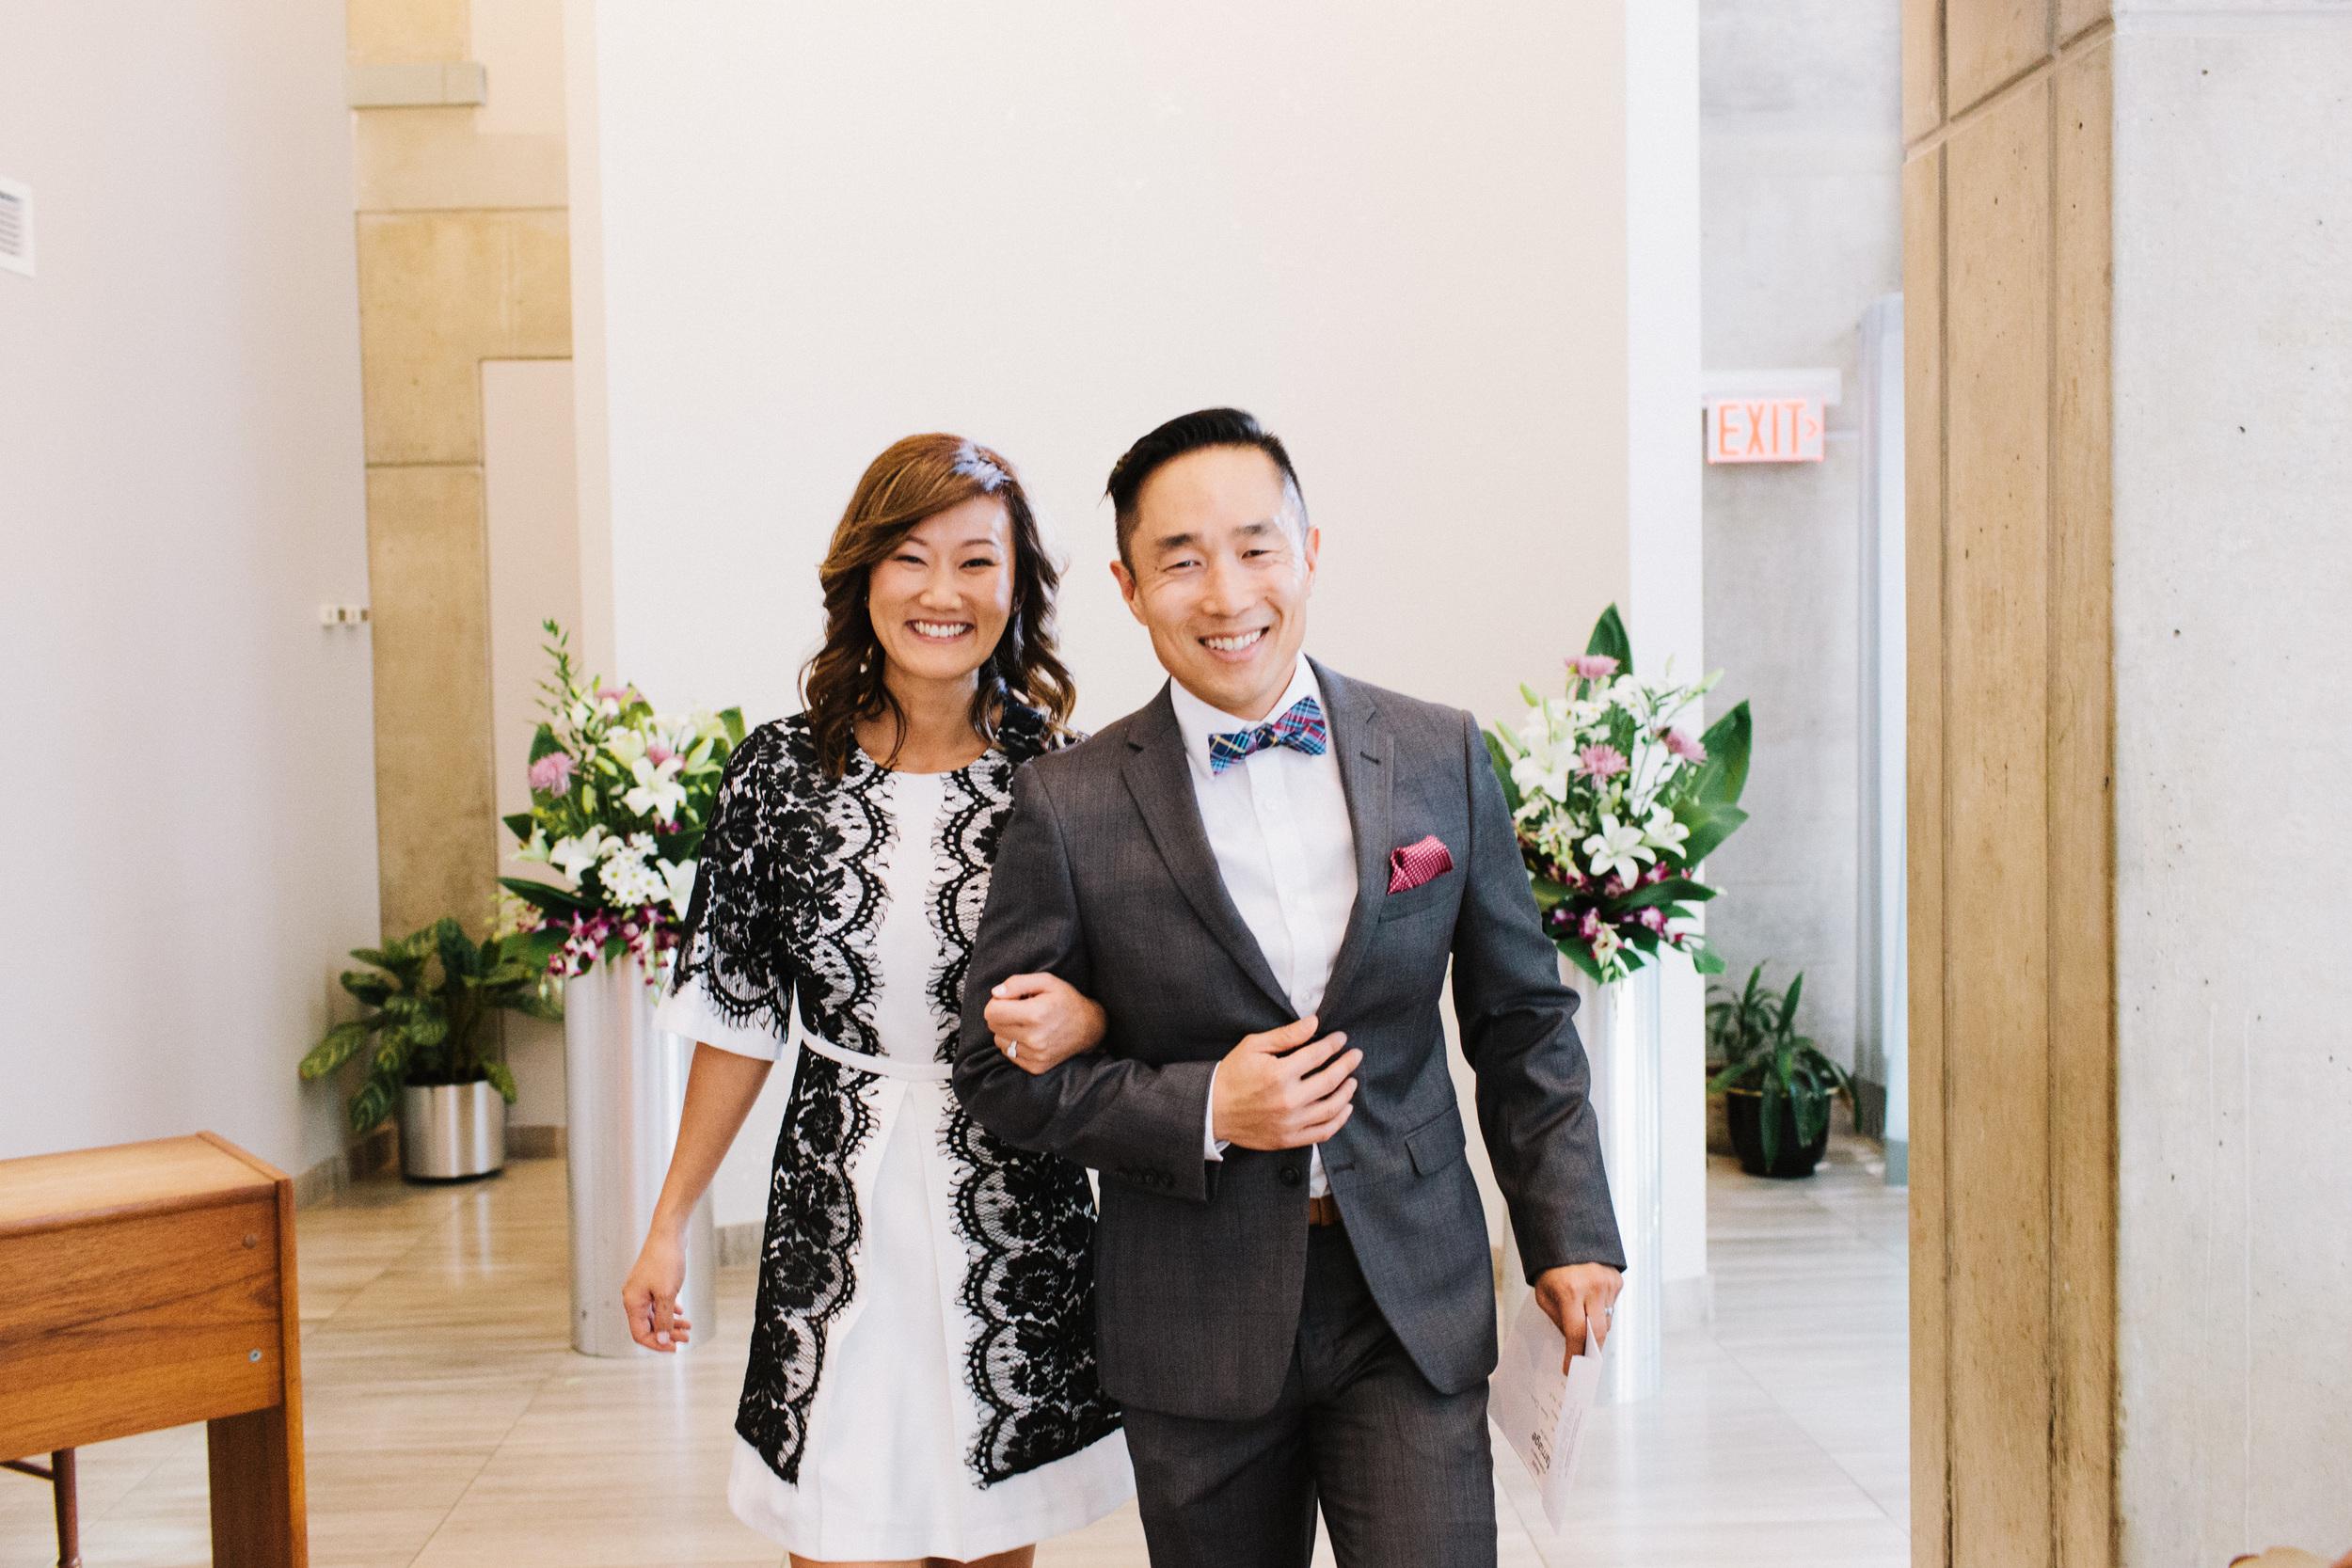 Toronto-City-Hall-Wedding-michael-rousseau-photography-024.jpg